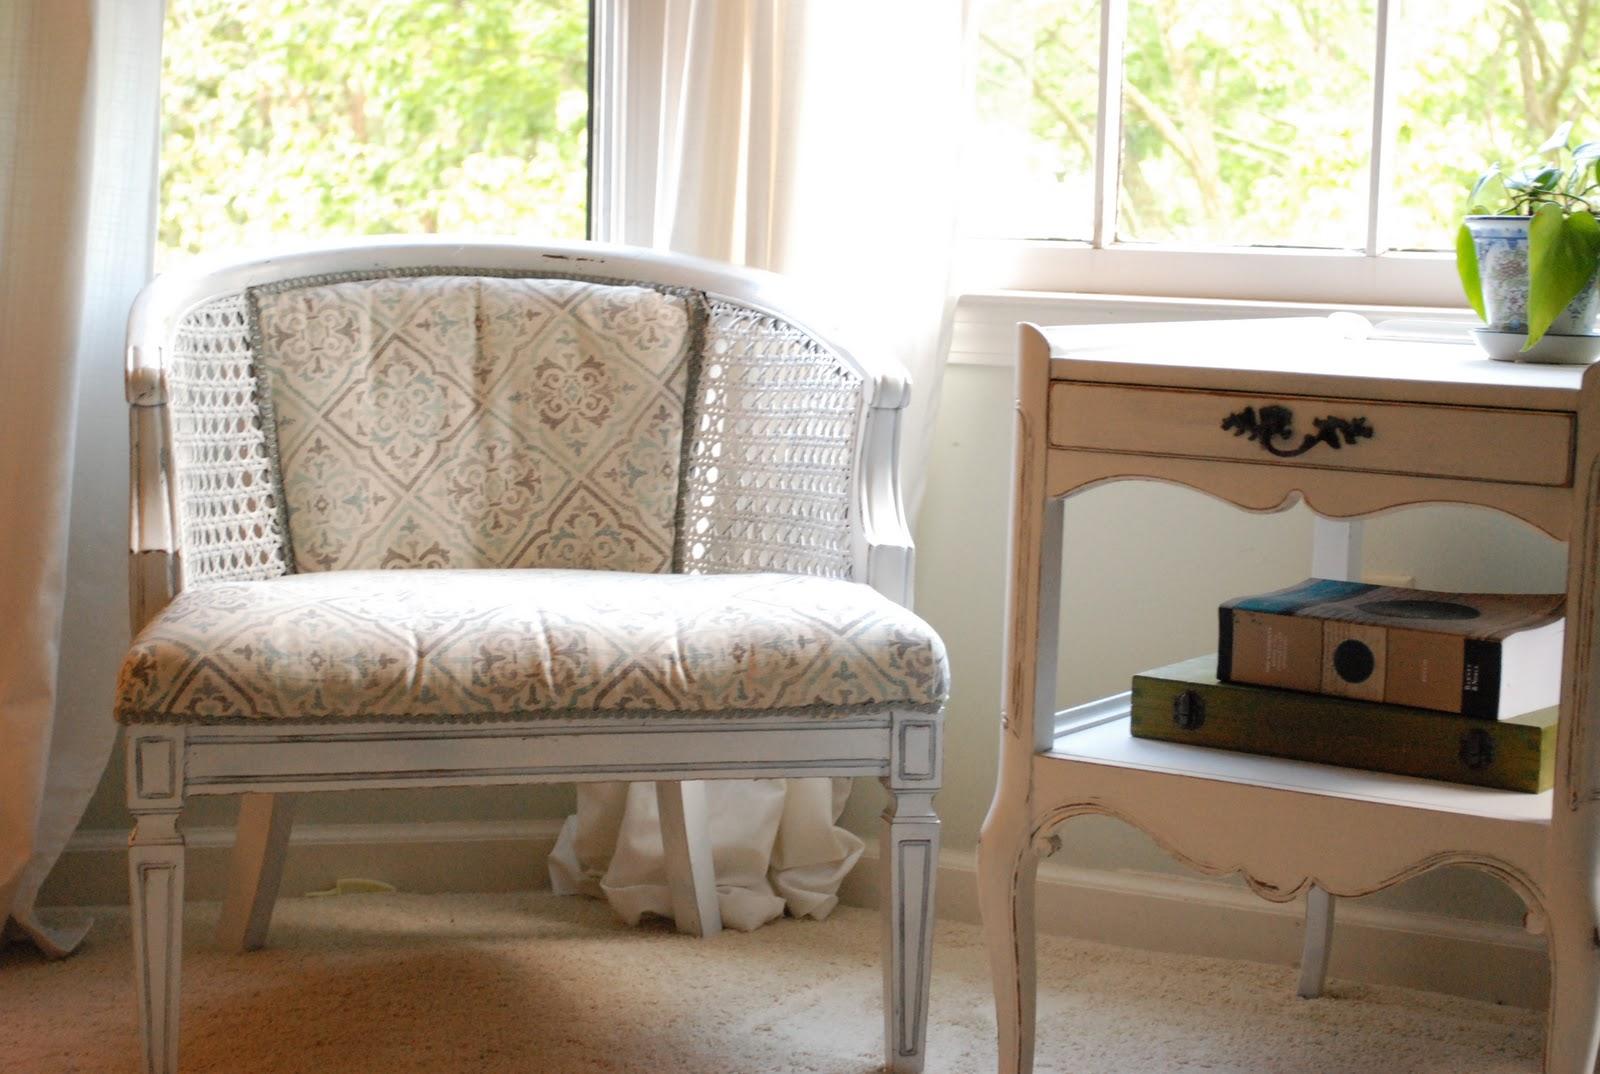 http://3.bp.blogspot.com/_StPPNXKF8GQ/TKNMmVSvlCI/AAAAAAAAAwA/d6bngYgrOEA/s1600/furniture+186.jpg